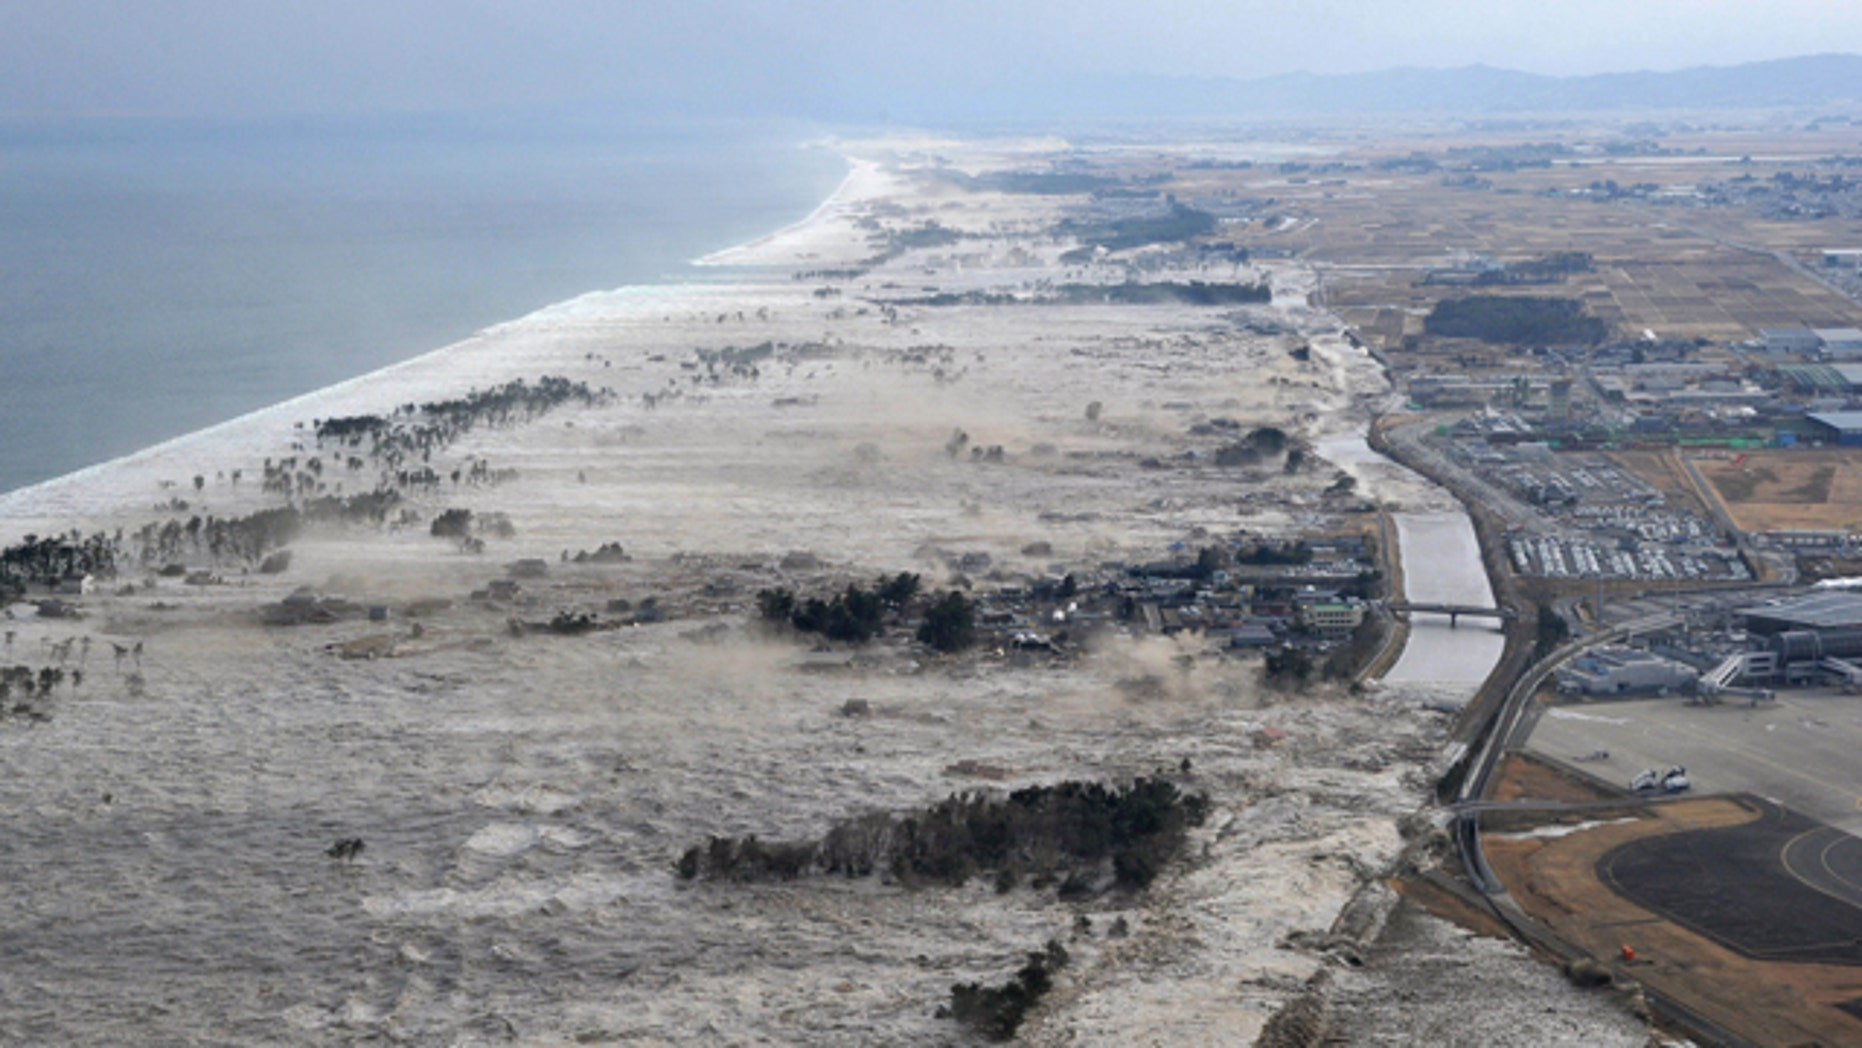 March 11: Earthquake-triggered tsumanis sweep shores along Iwanuma in northern Japan.